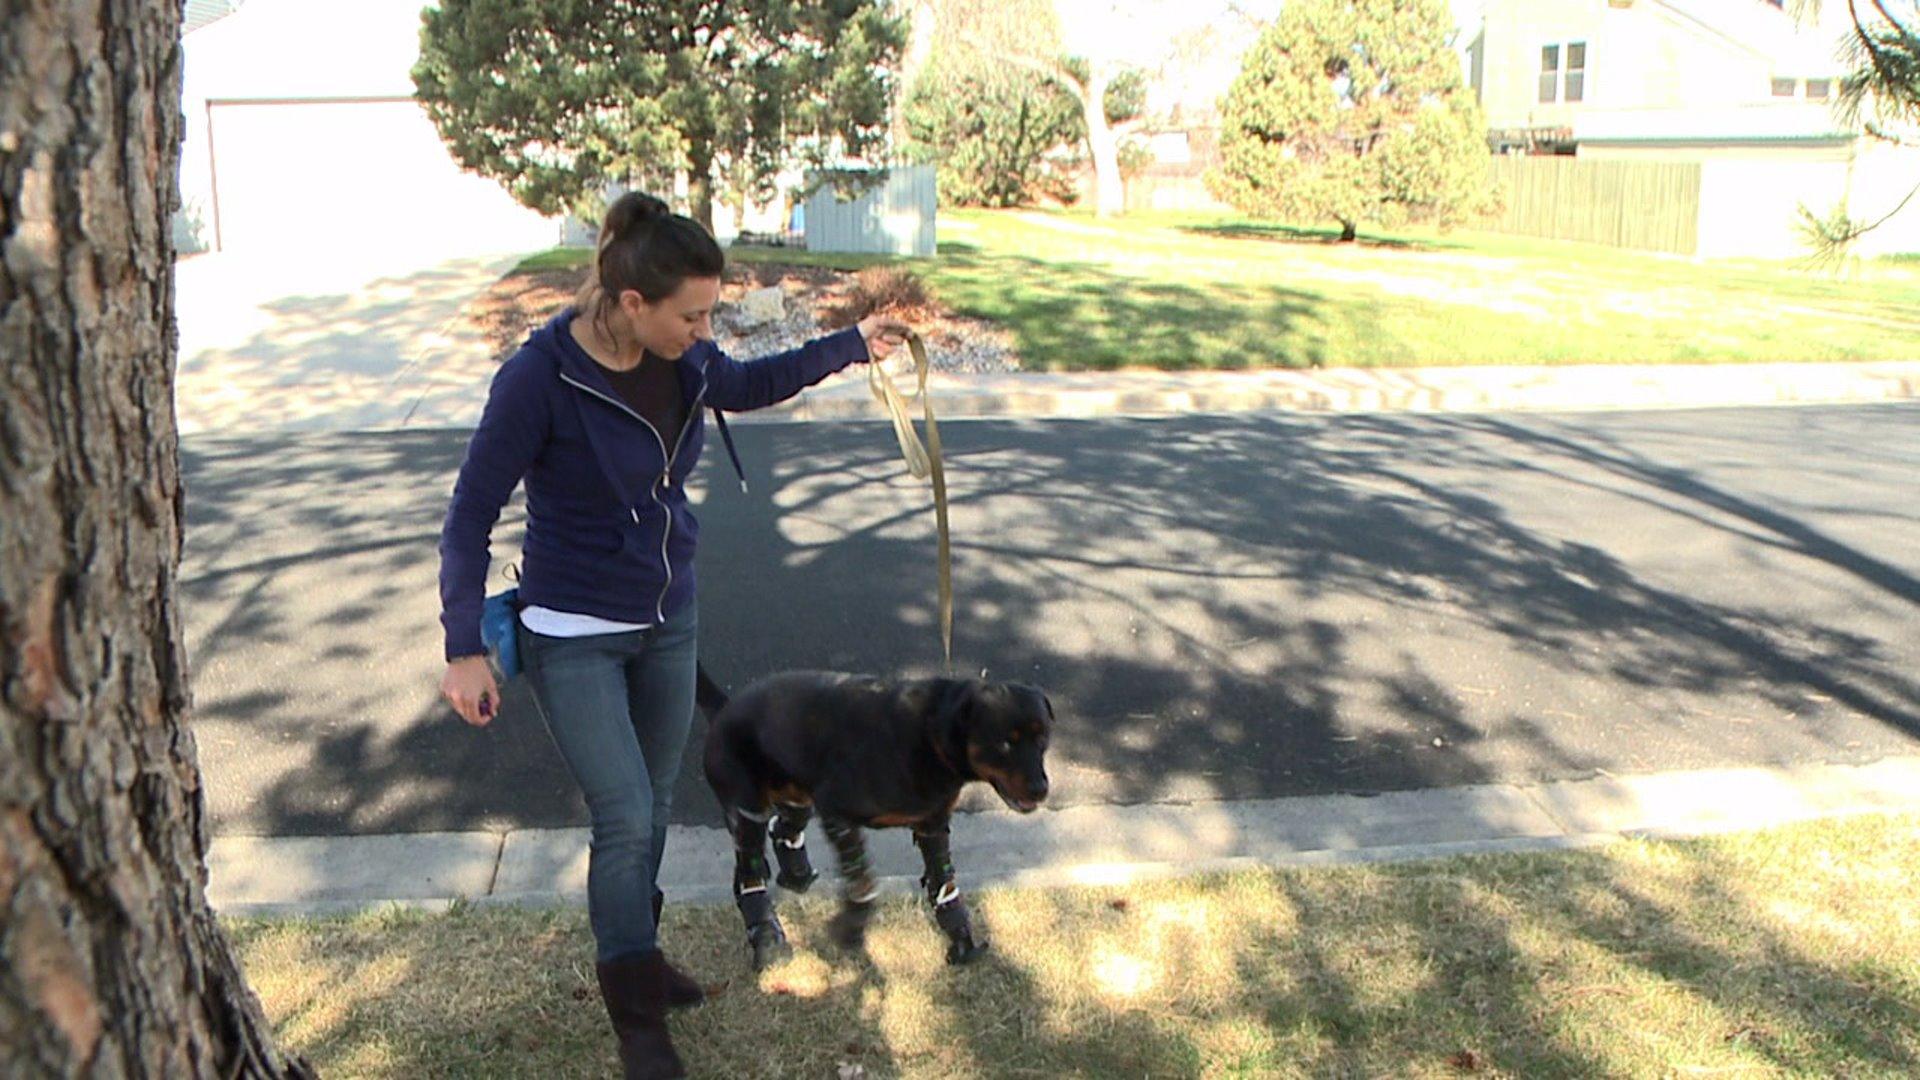 Quadruple amputee dog gets around in full set of prostetics